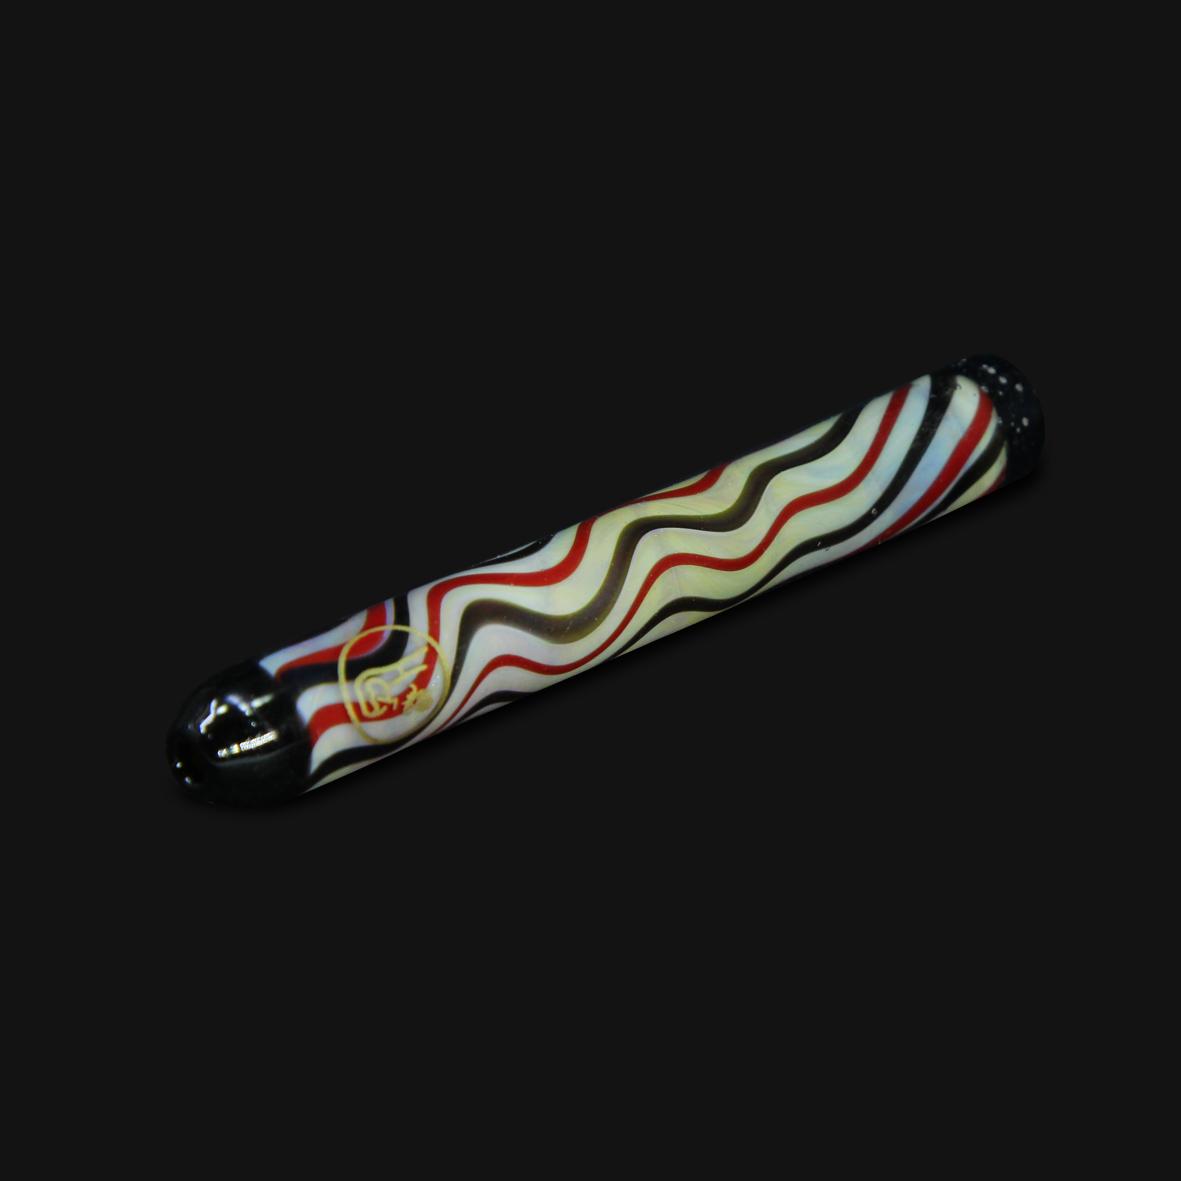 Piteira de Vidro Wig-Wag Weirdo #10